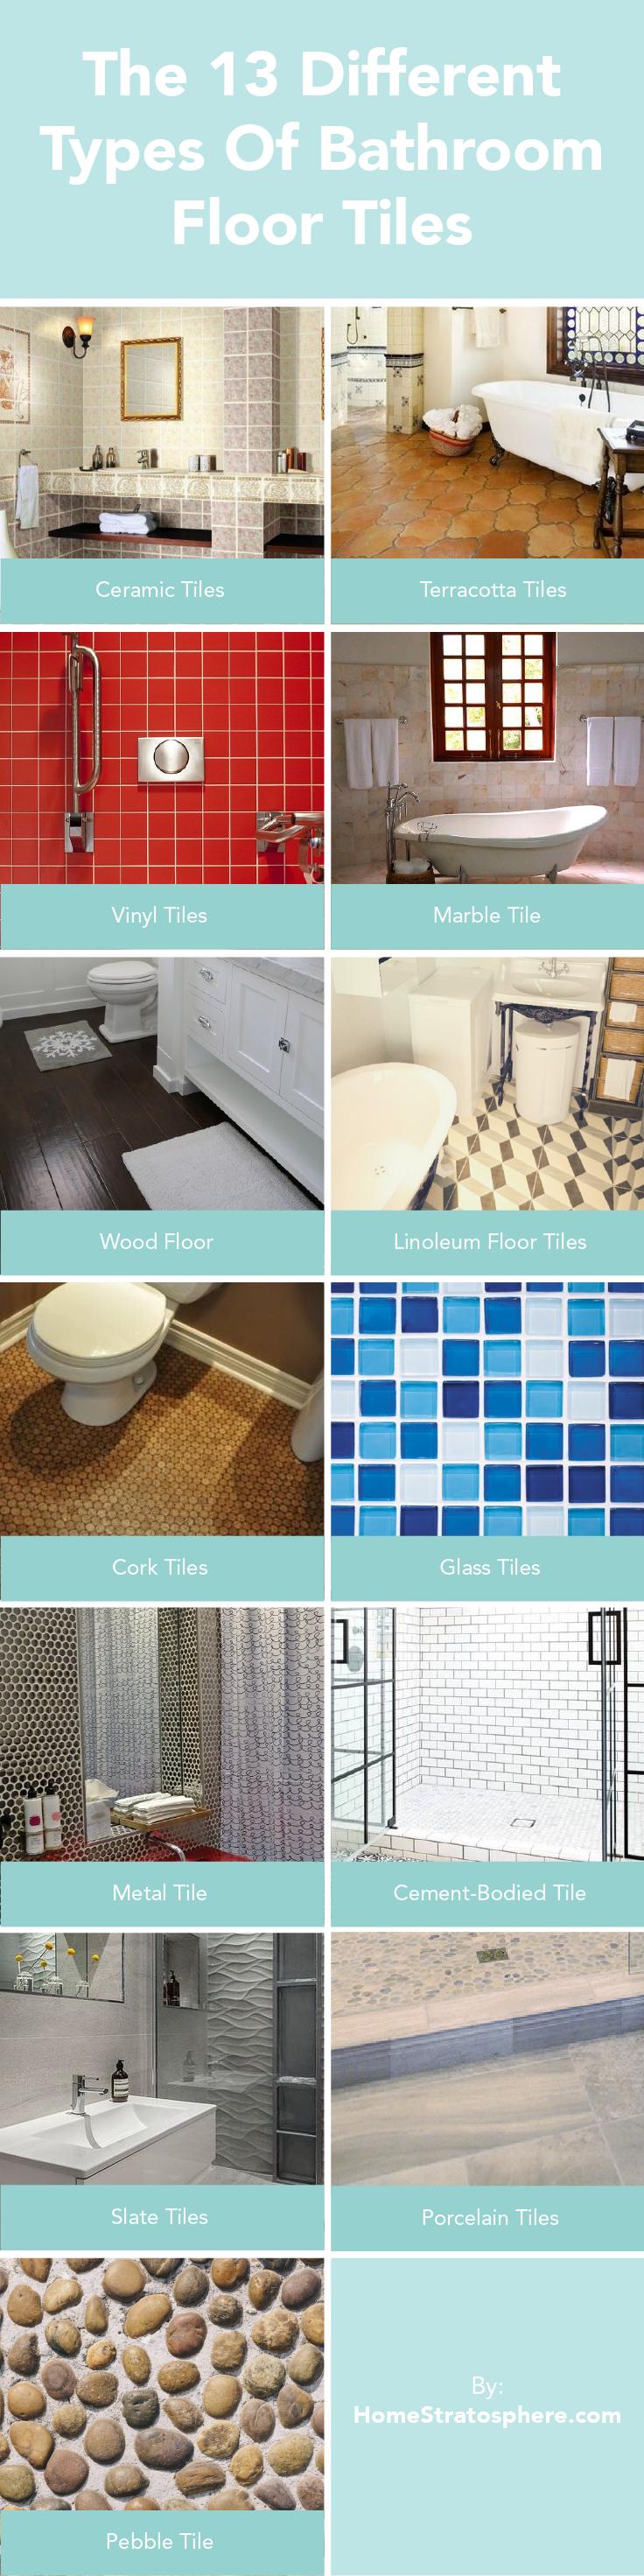 The Different Types Of Bathroom Floor Tiles Pros And Cons - Different types of bathroom flooring